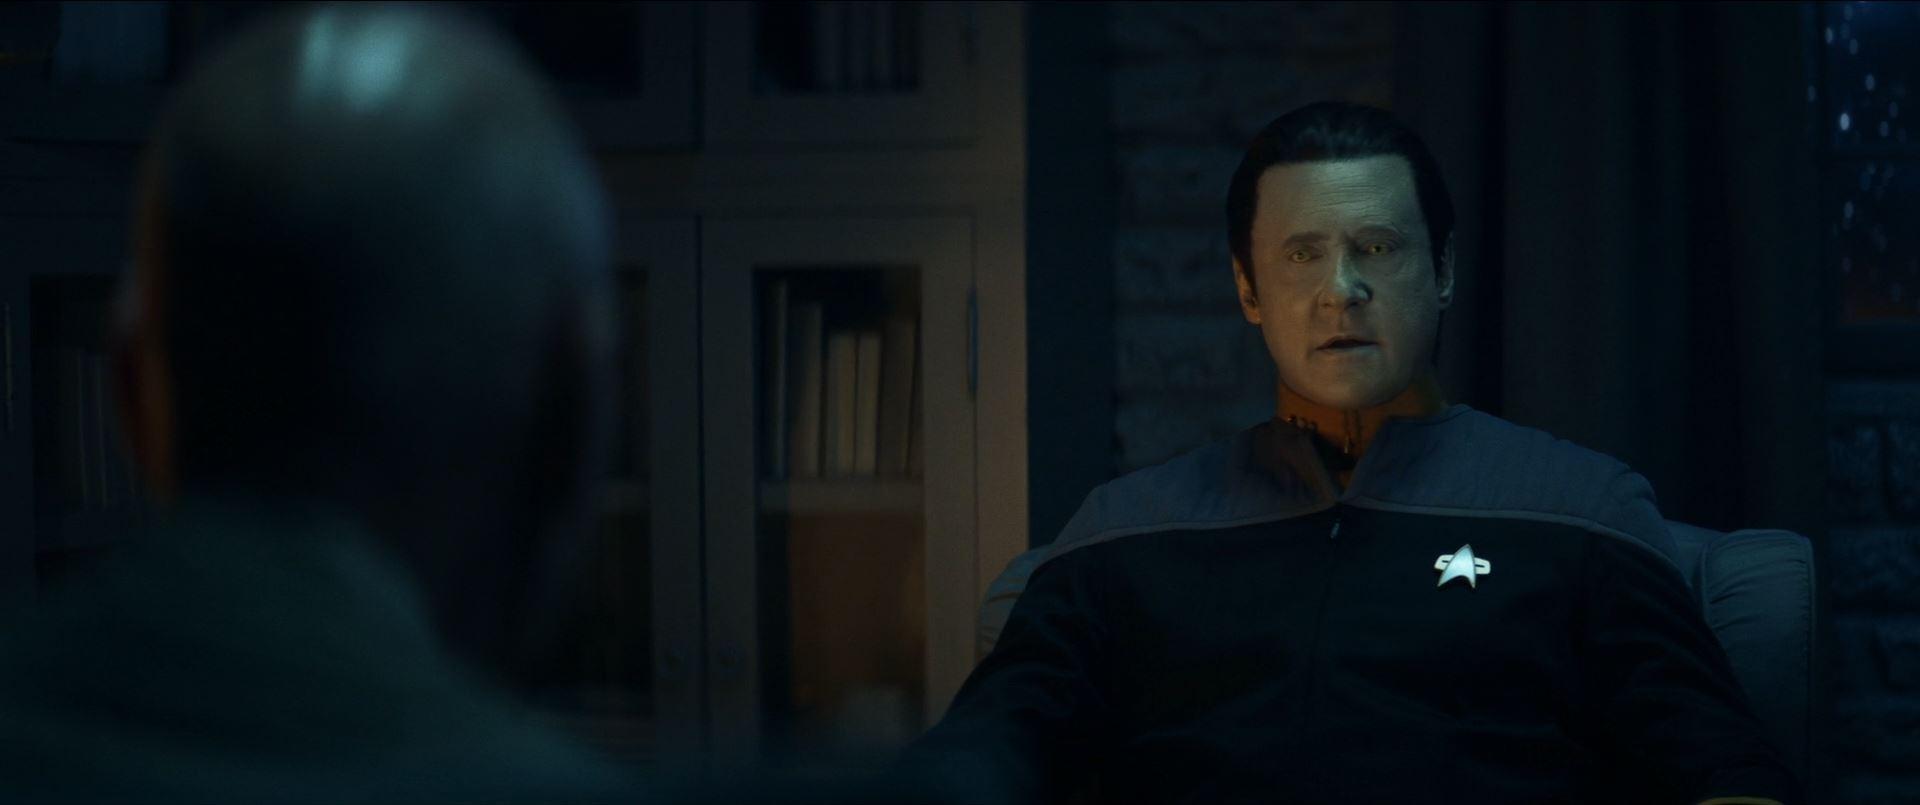 Star Trek Picard S01E10 Et in Arcadia Ego Part 2 Review - Data simulation